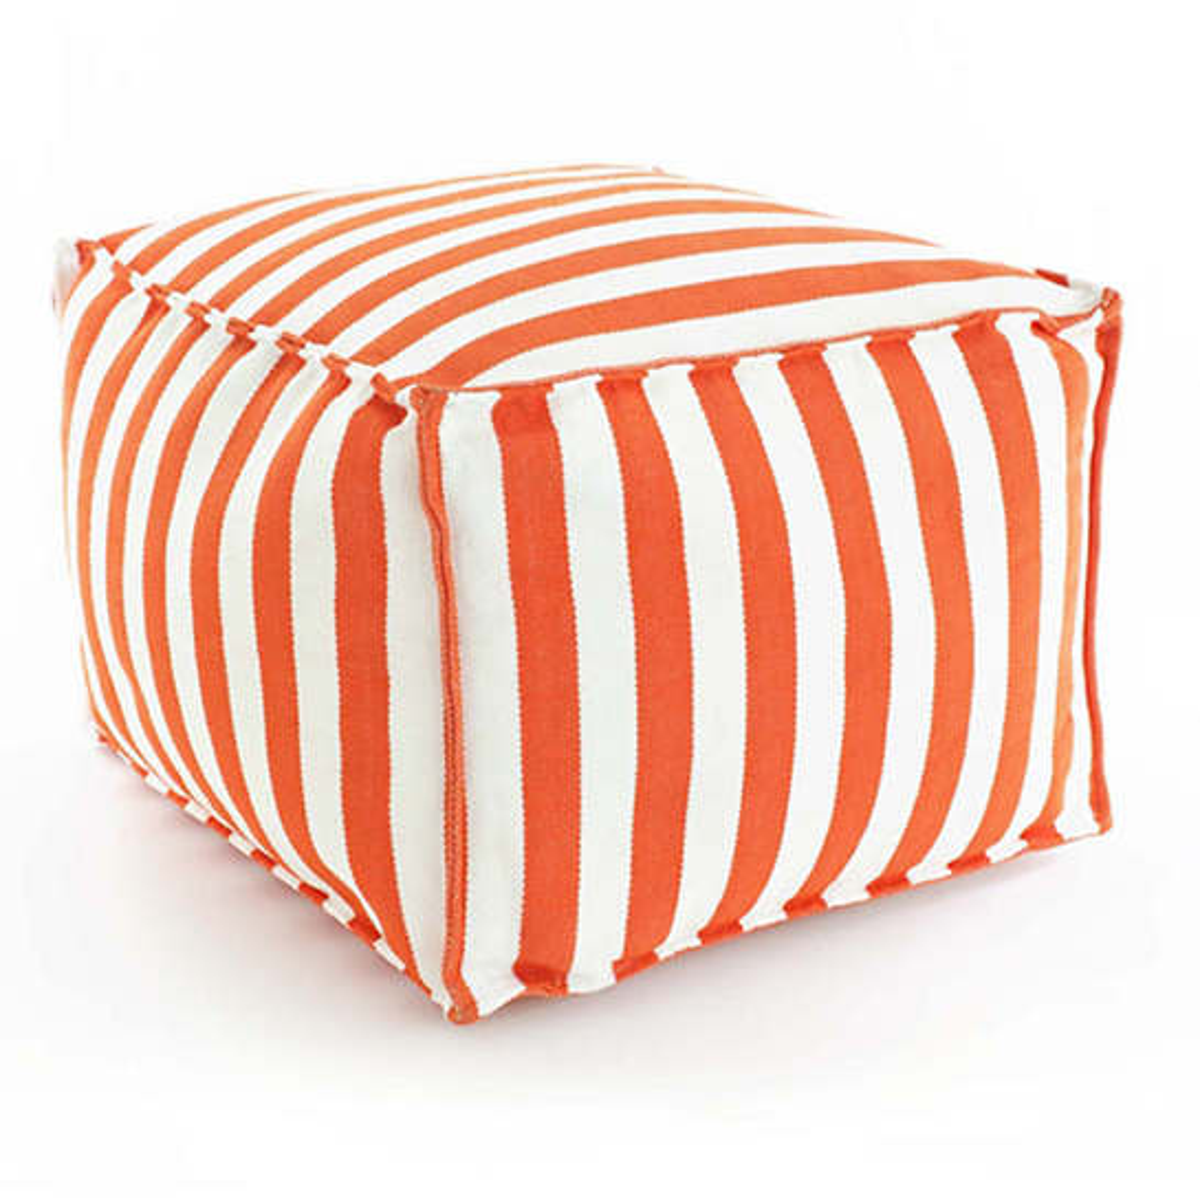 Fresh American Trimaran Stripe Tangerine/White Indoor/Outdoor Pouf